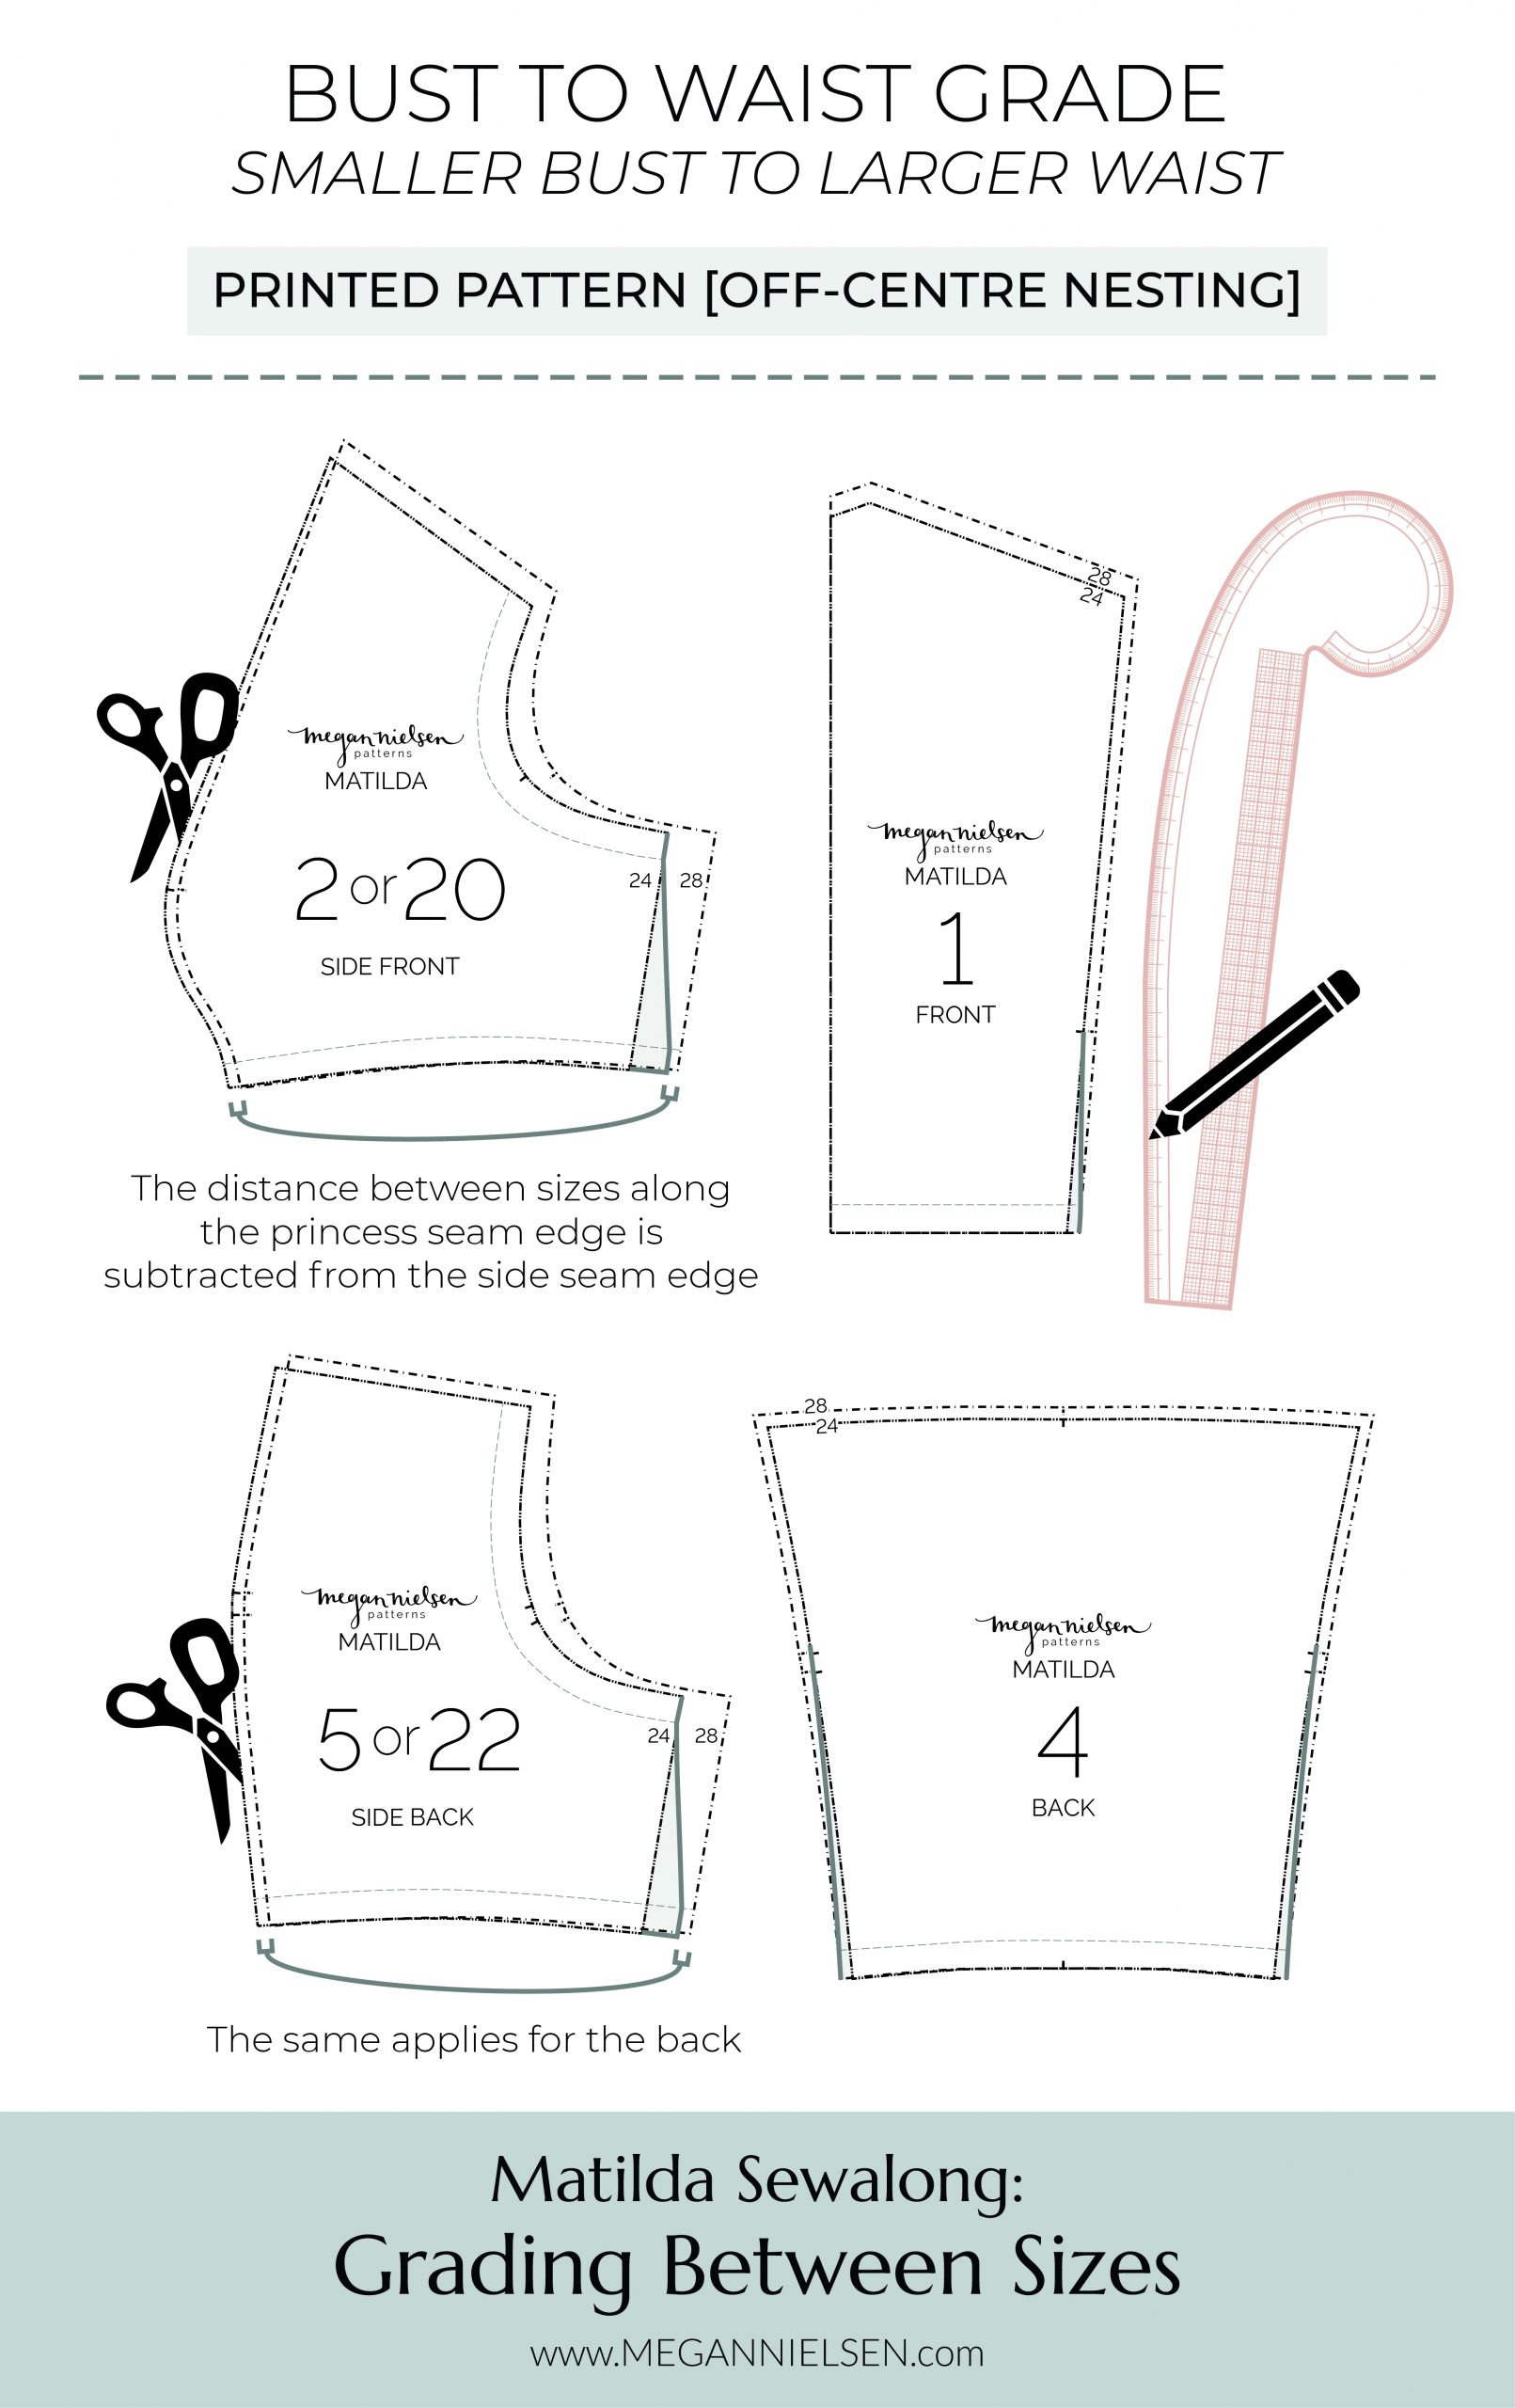 Megan Nielsen Patterns   Matilda Sewalong: Grading Between Sizes - Smaller Bust To Larger Waist Grade - Printed Patterns